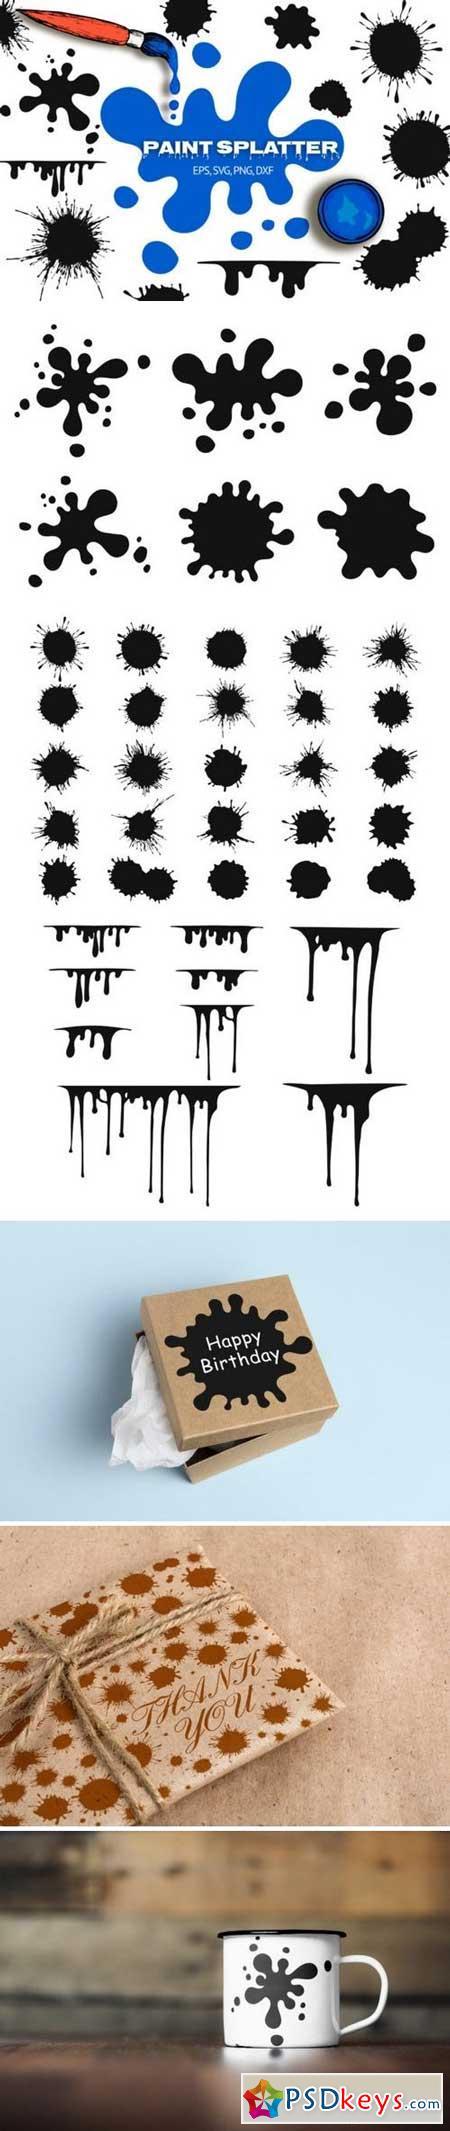 40 Hand Drawn Paint Splatters 866321